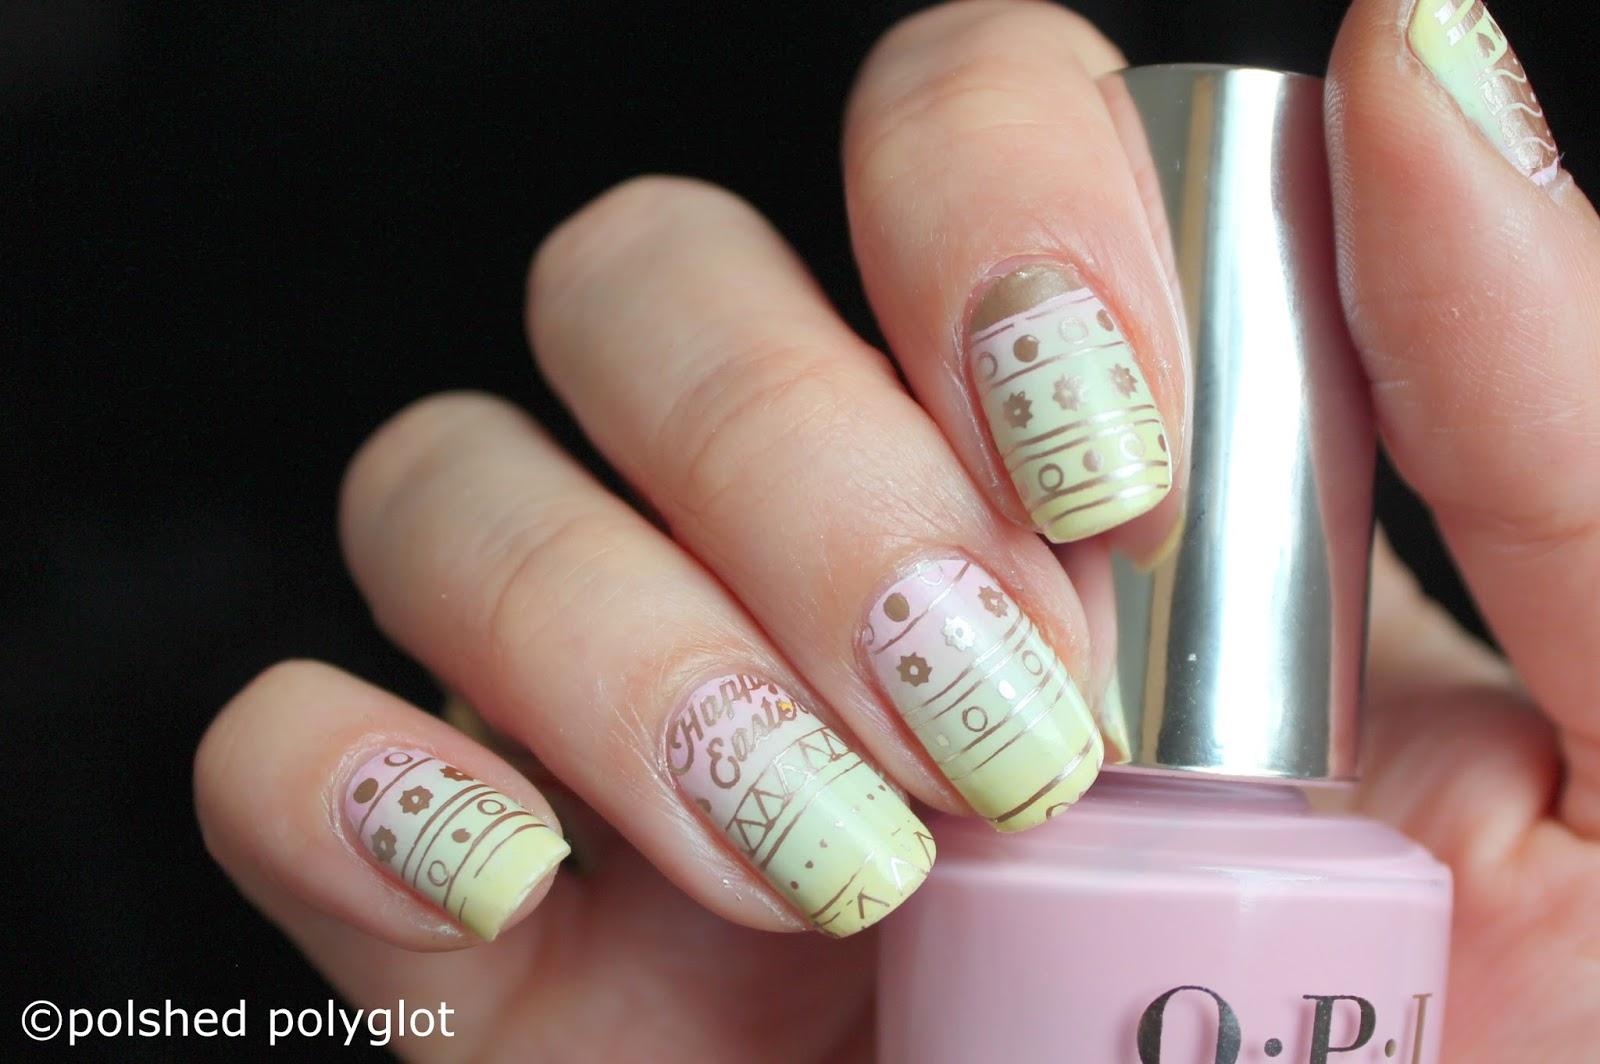 Why Does Nail Polish Dry My Nails Out | Splendid Wedding Company